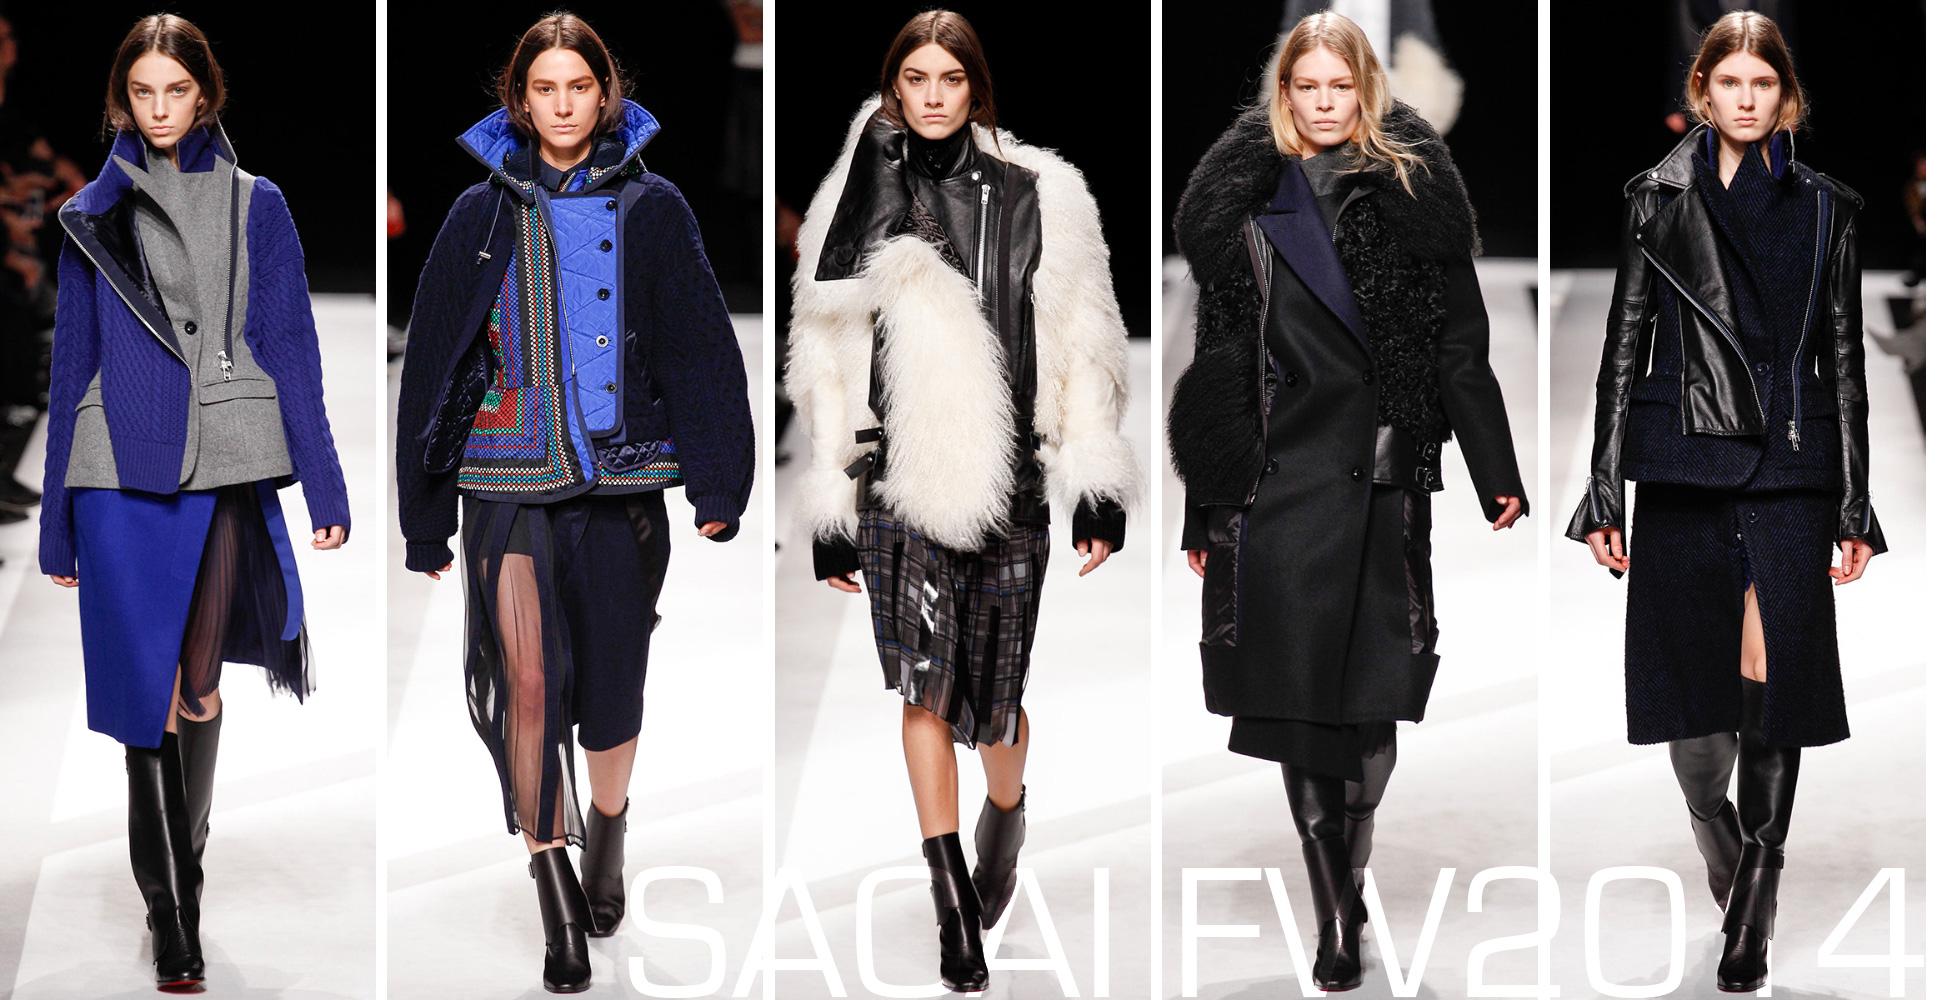 Sacai via The Rosenrot | For The Love of Avant-Garde Fashion